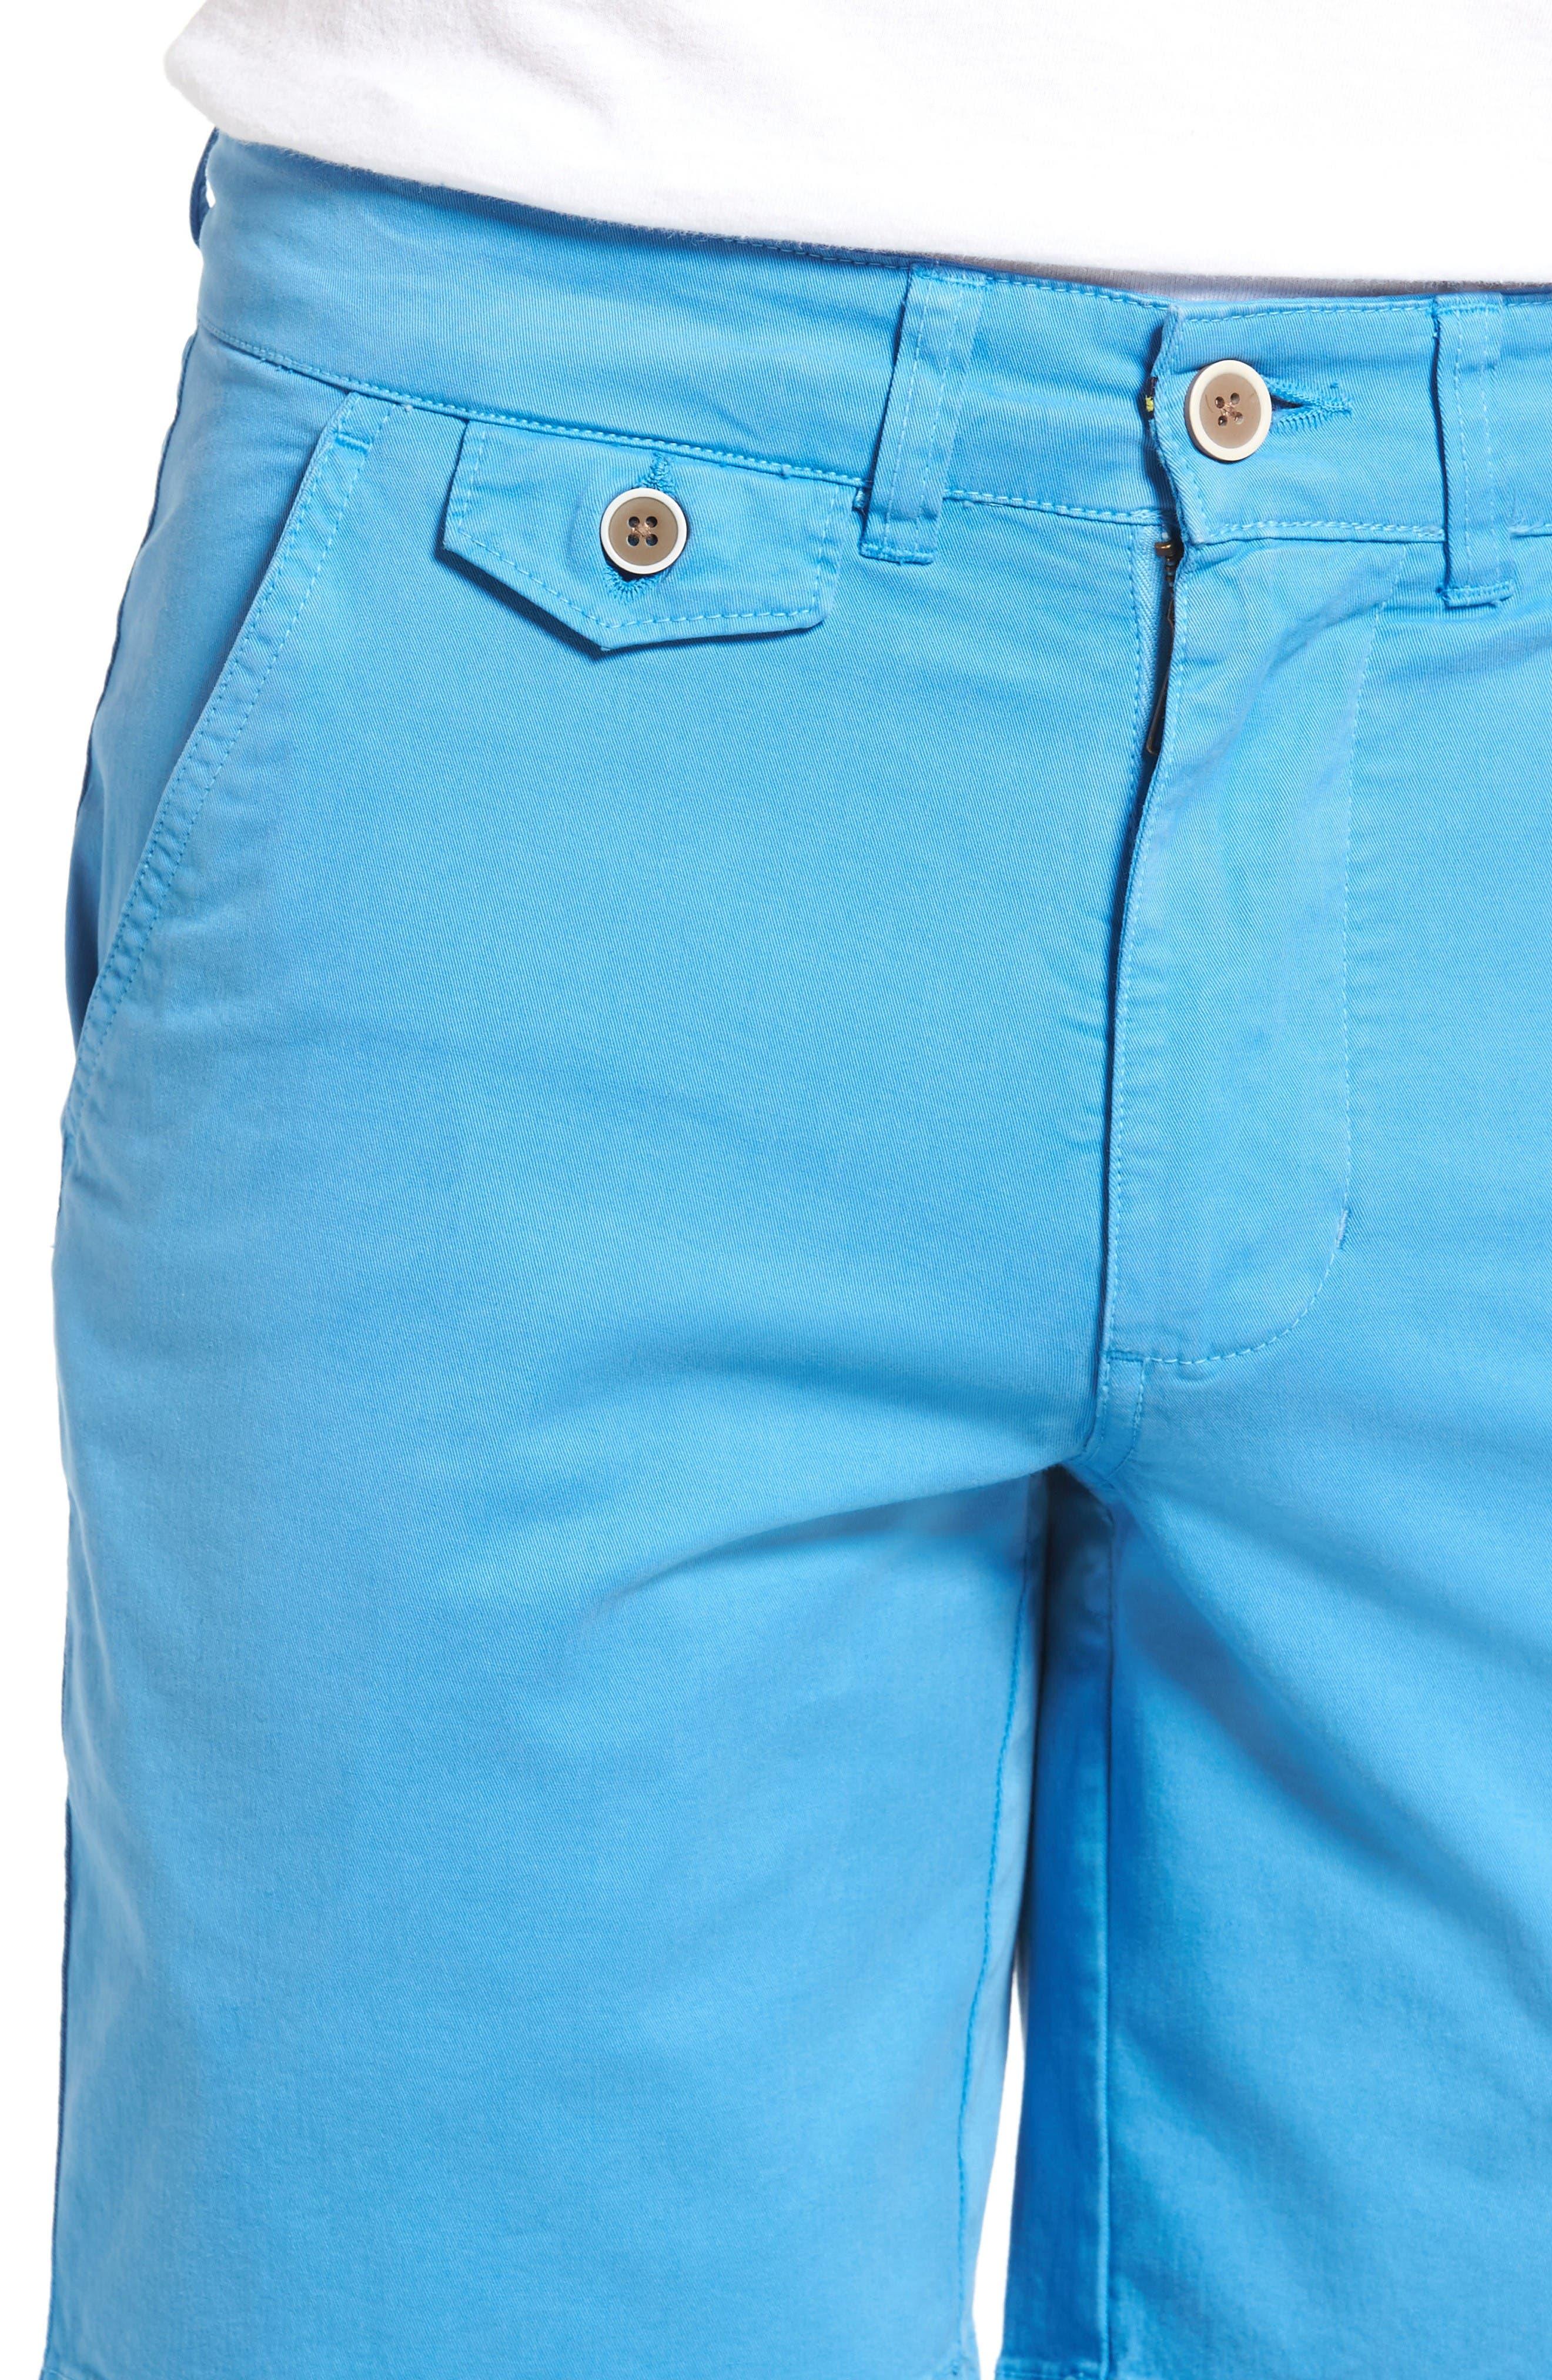 'Sunny' Stretch Chino Shorts,                             Alternate thumbnail 4, color,                             Hurricane